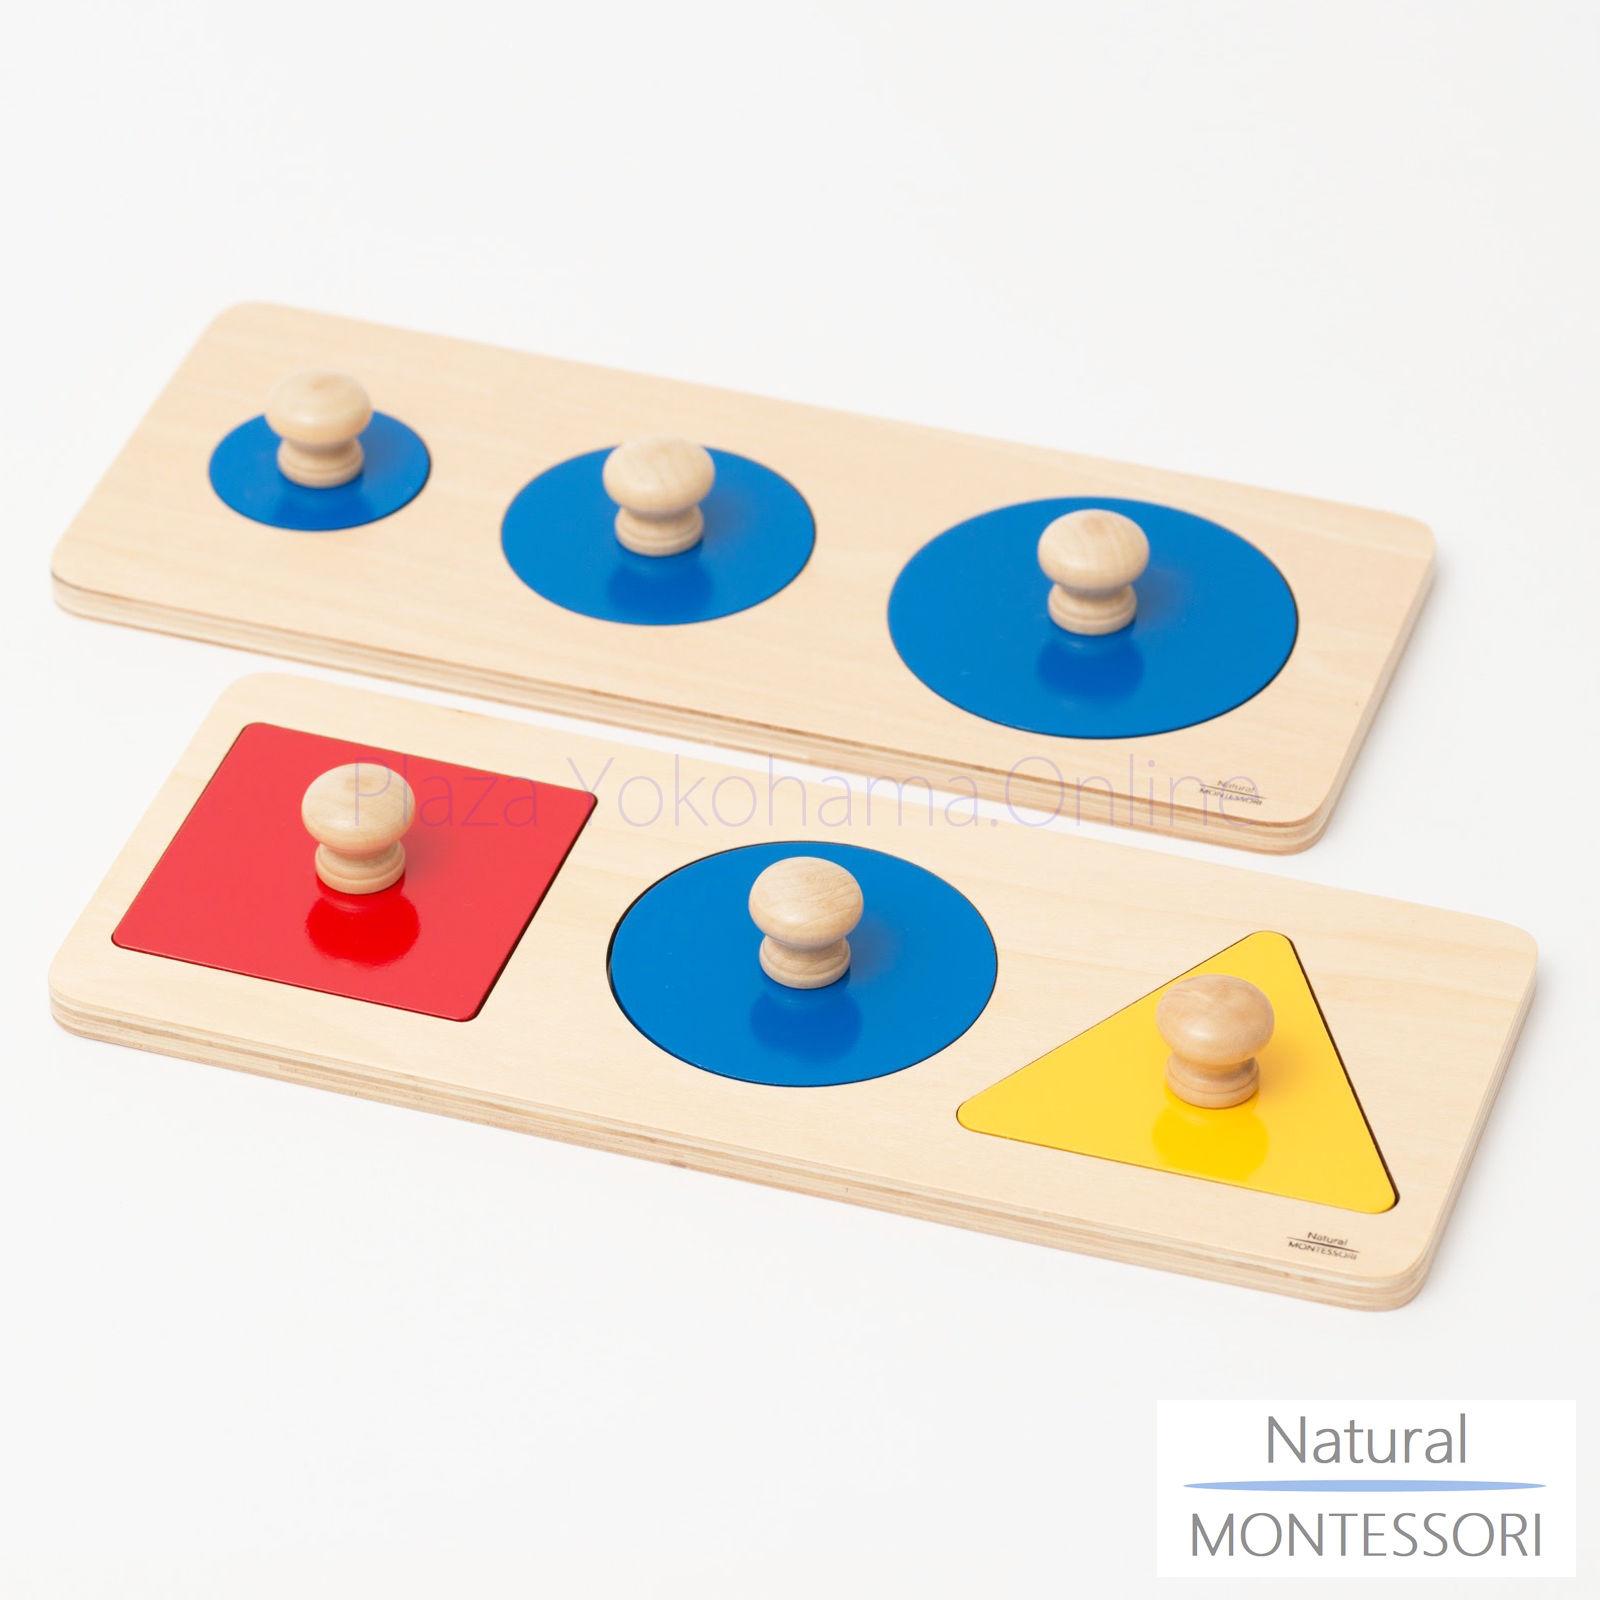 【Natural MONTESSORI】NM-B002 はめ込みパズルB(2枚セット)  ≪OUTLET≫